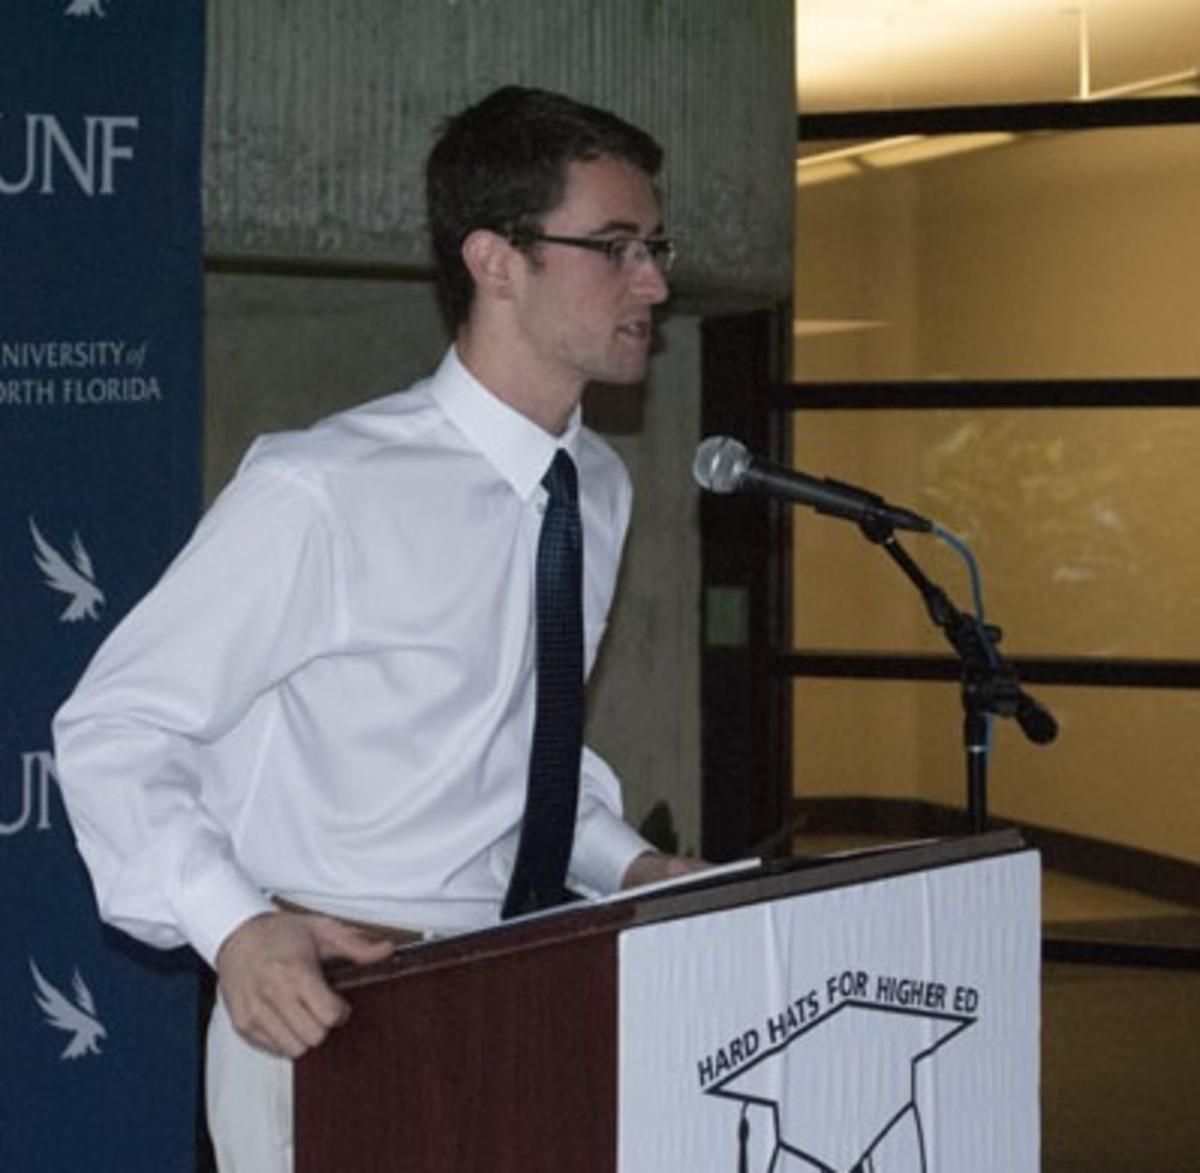 Carlo Fassi, Student Body President. Photo by Zack Schoenheide